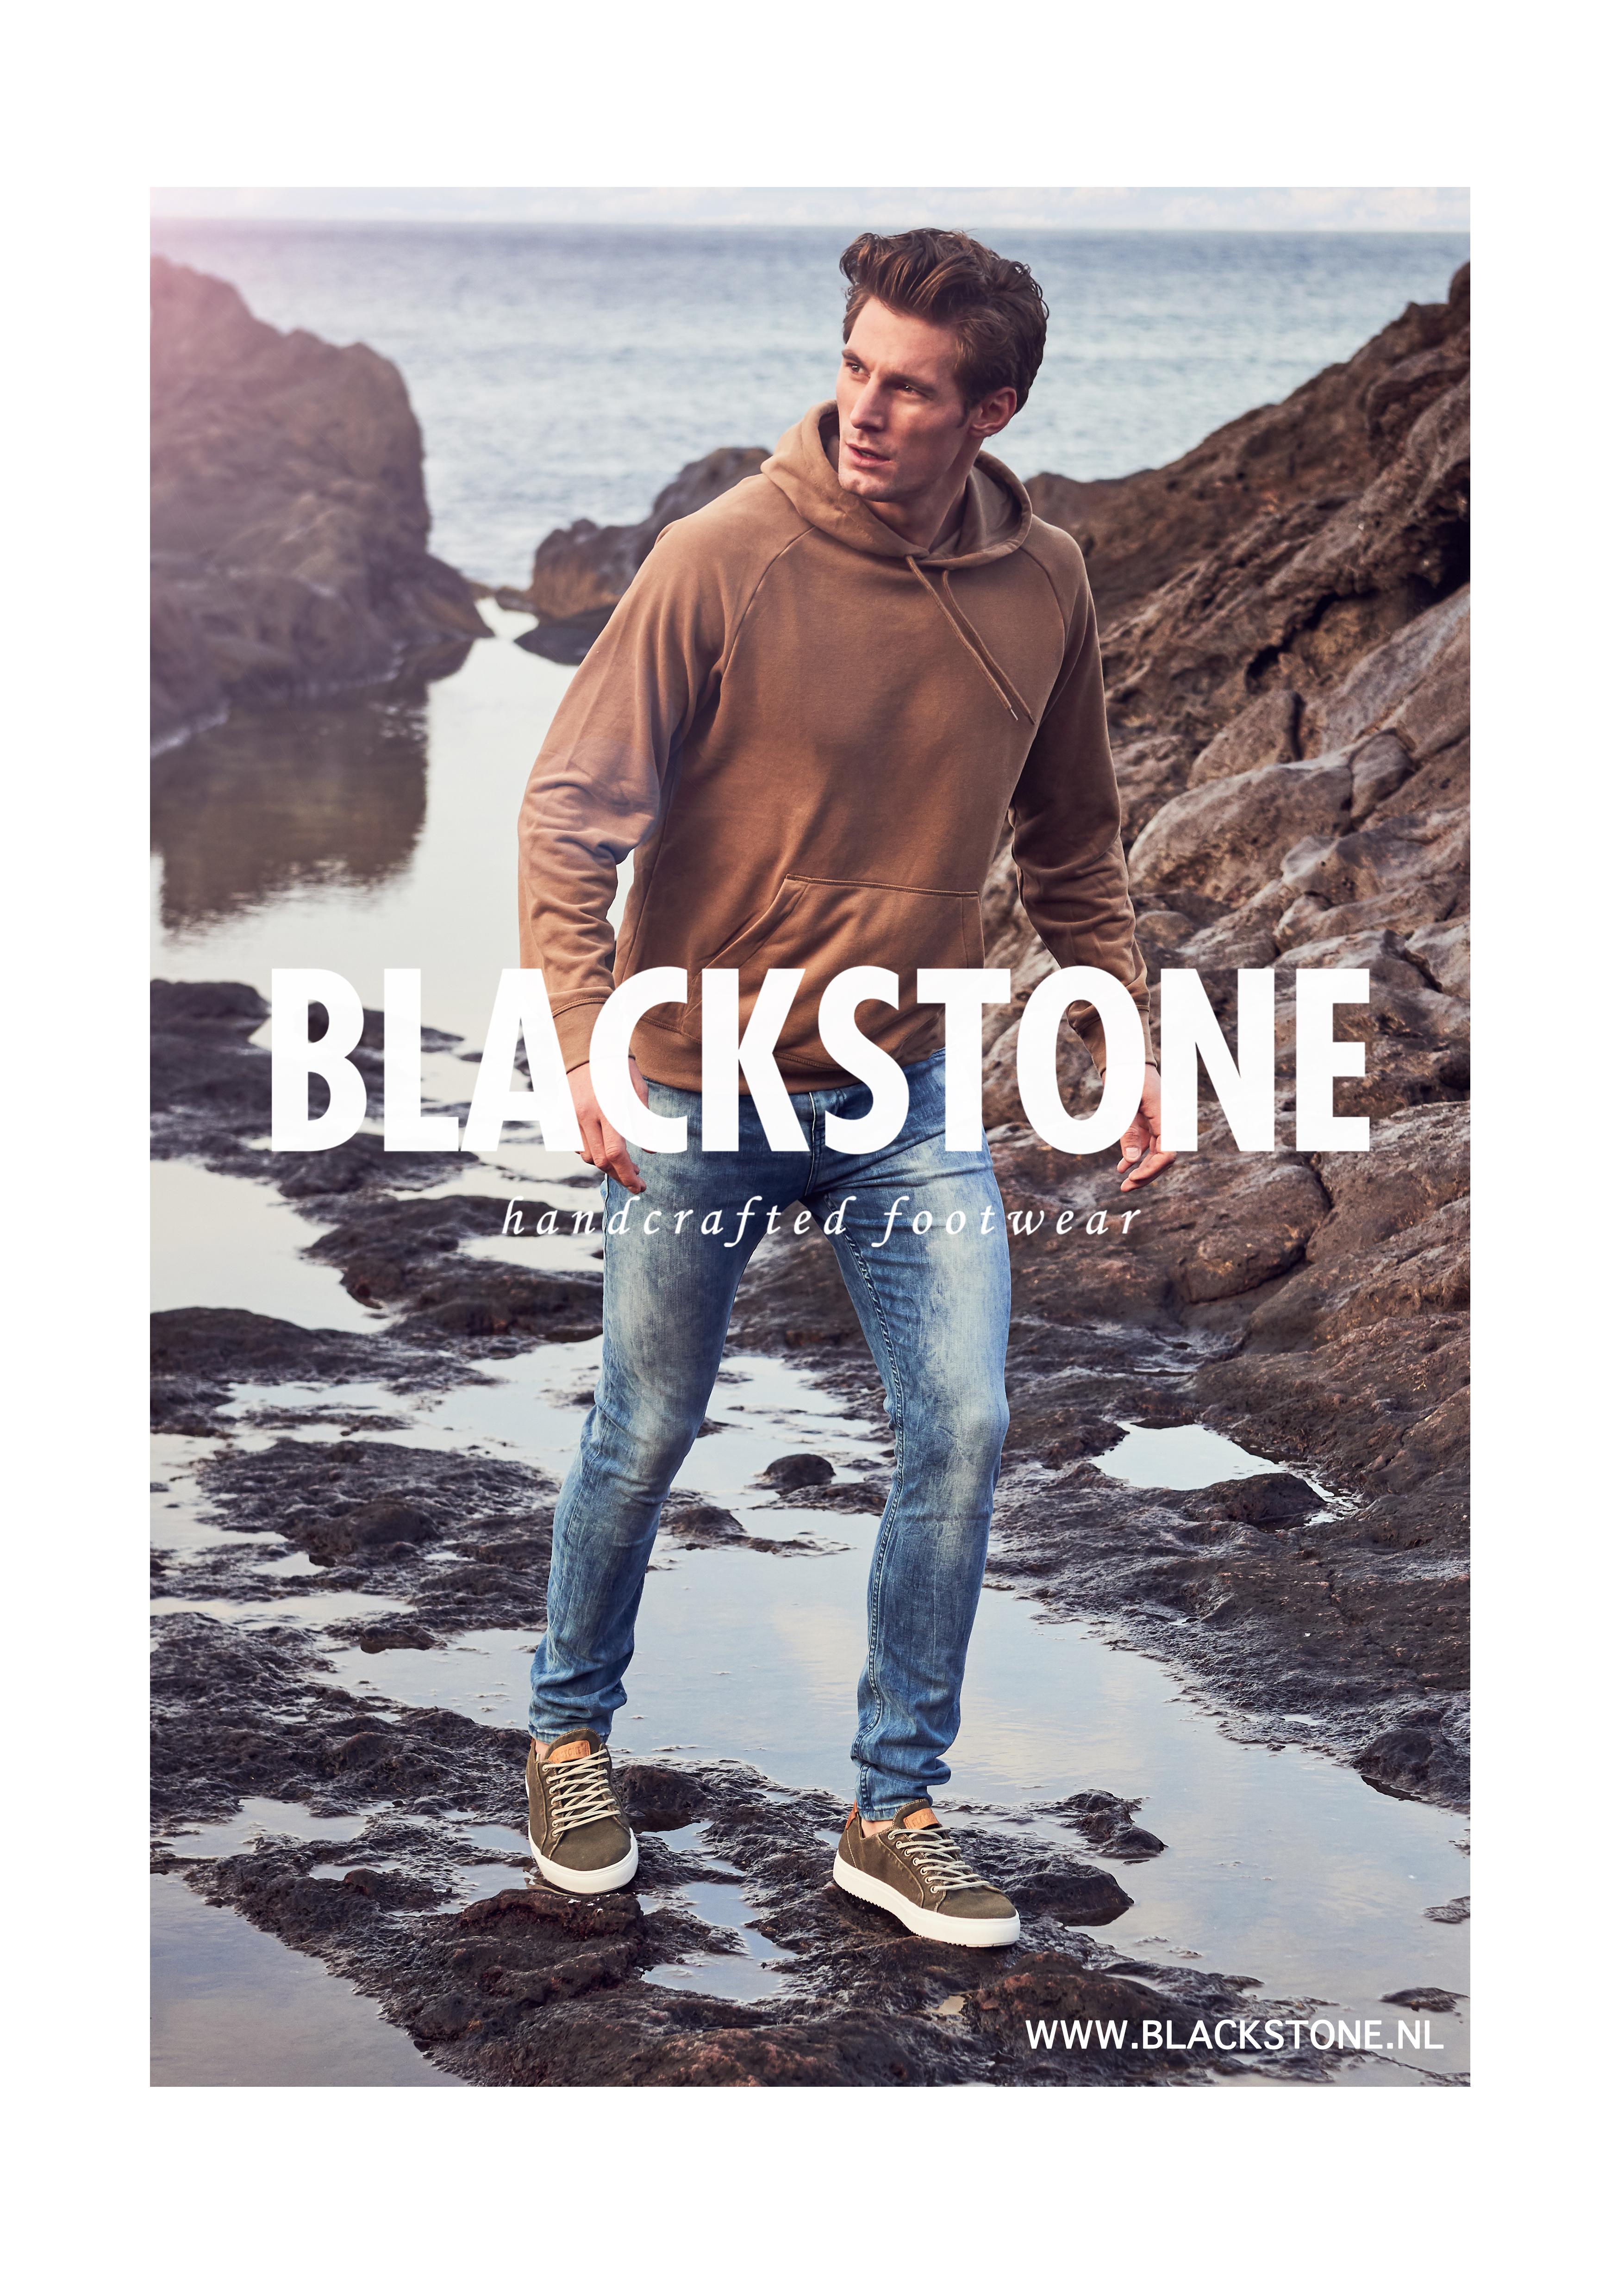 blackstone ad2